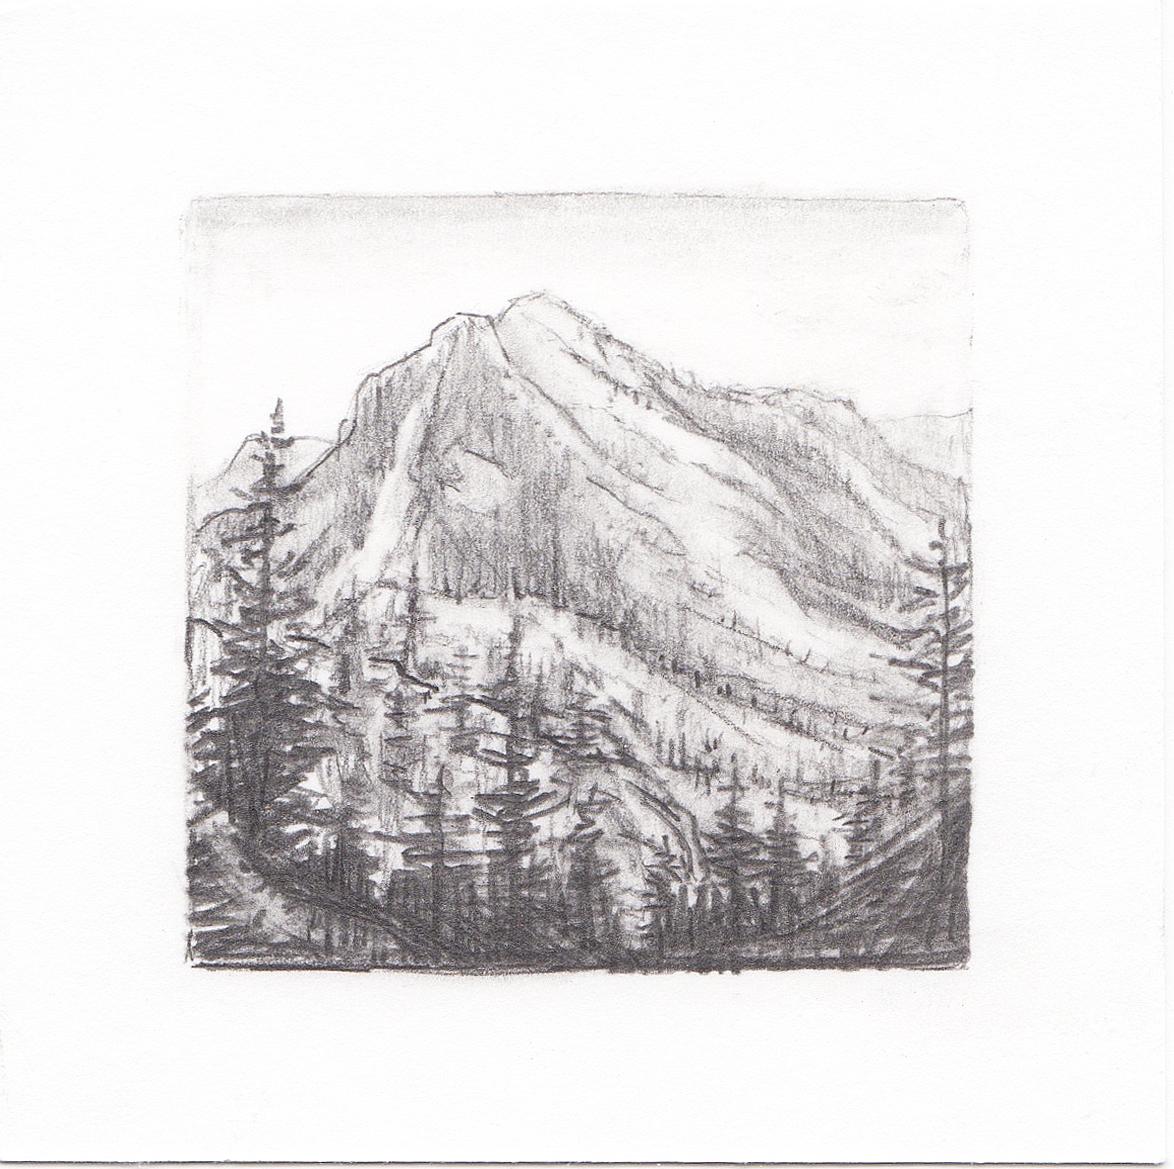 #60 Wasatch Mountains, Utah | 3x3 | graphite